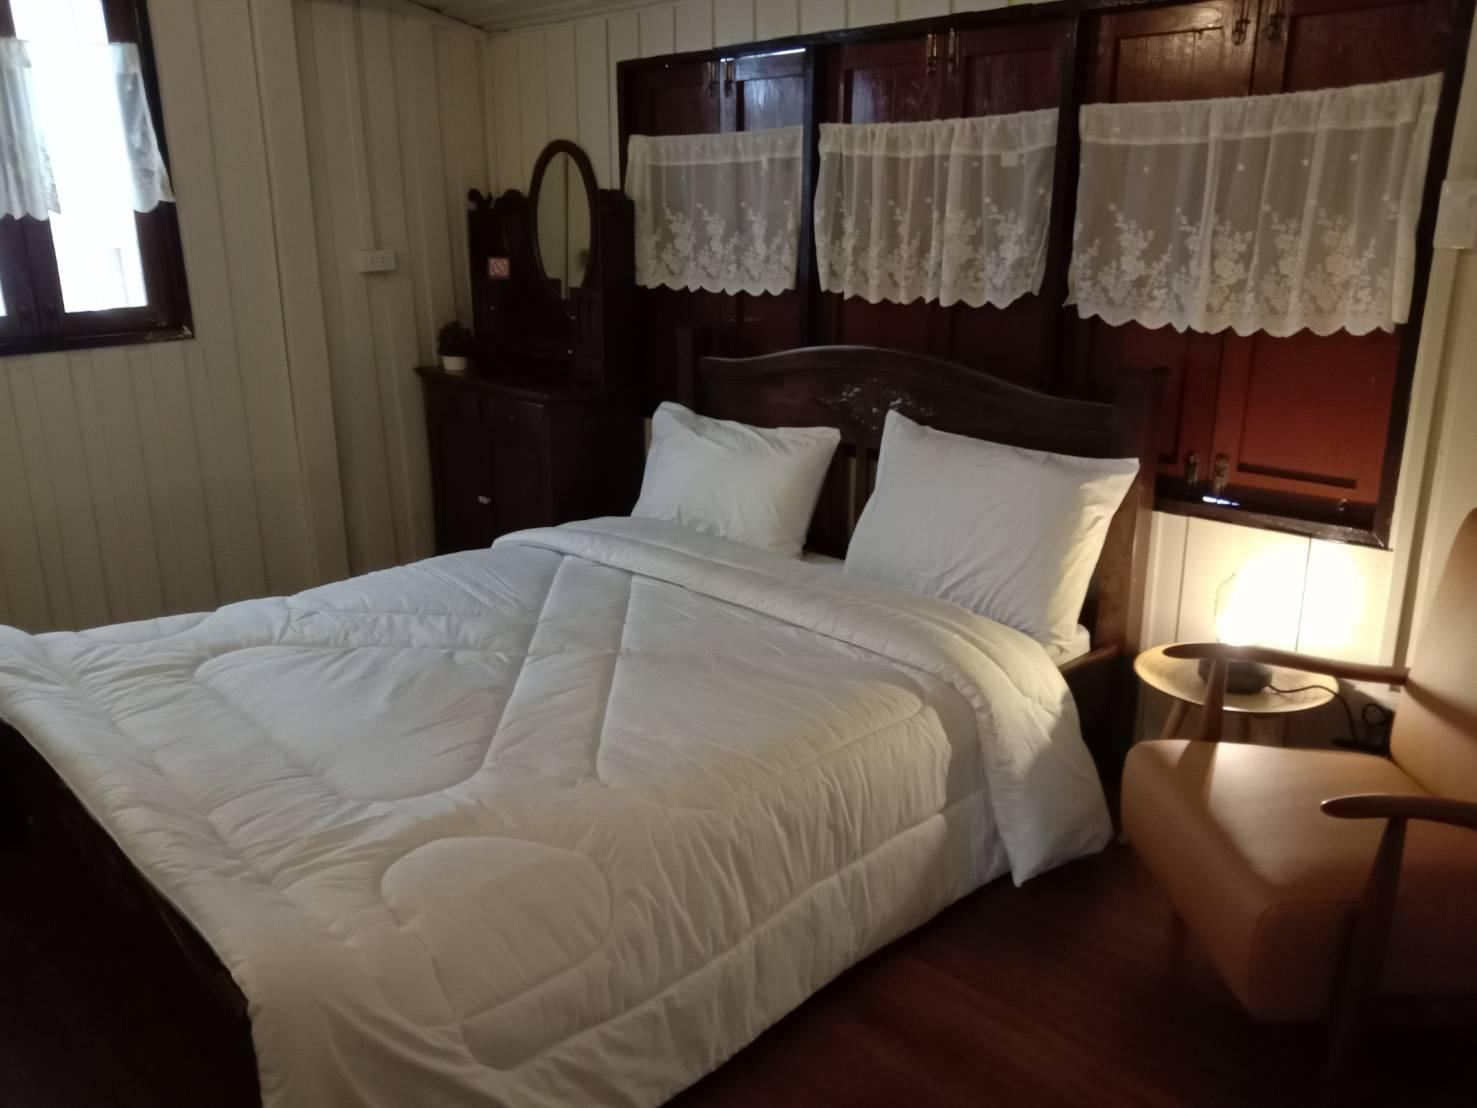 One bed room with shared bathroom บ้านเดี่ยว 3 ห้องนอน 3 ห้องน้ำส่วนตัว ขนาด 45 ตร.ม. – ธนบุรี